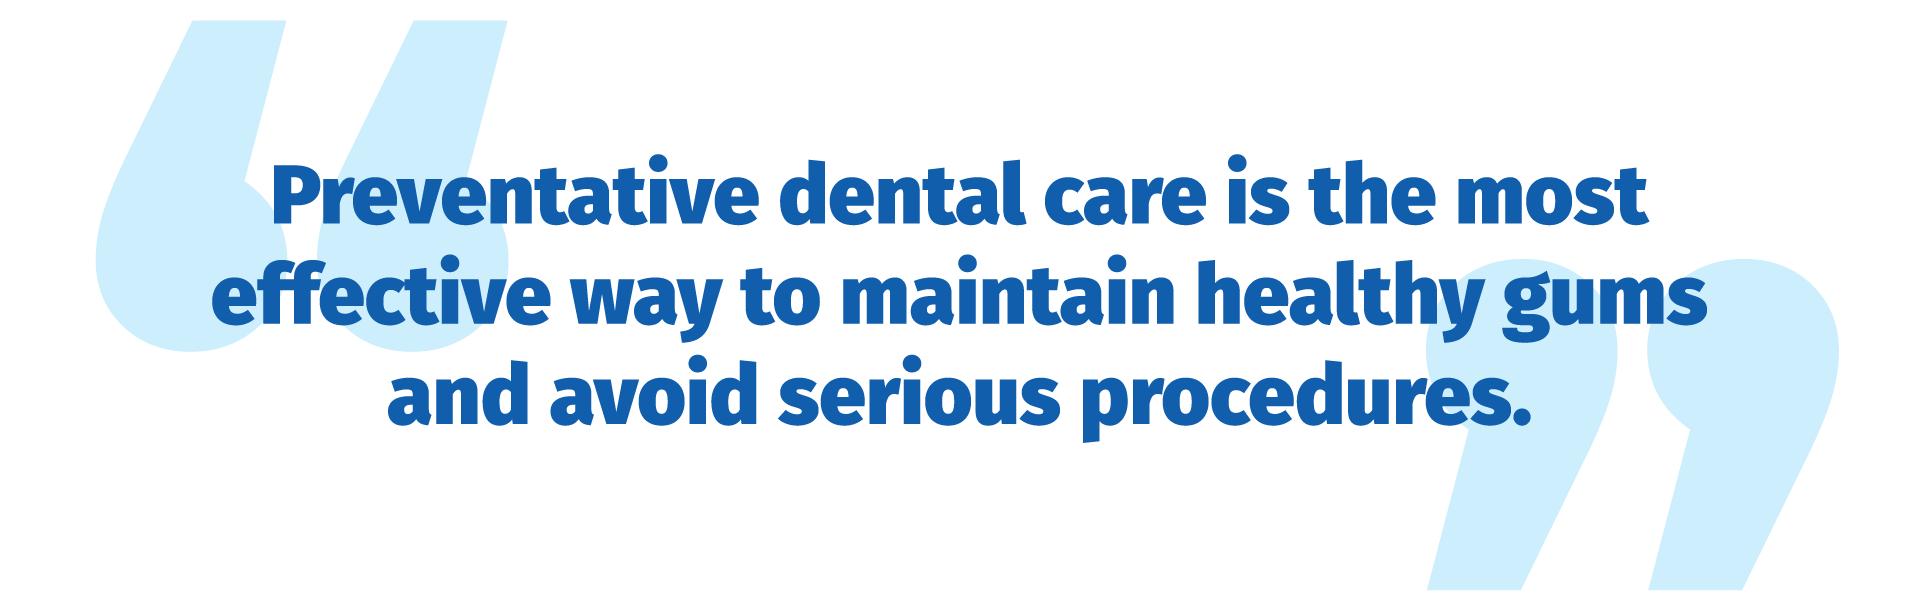 Gum disease_Blog_gaphics-01